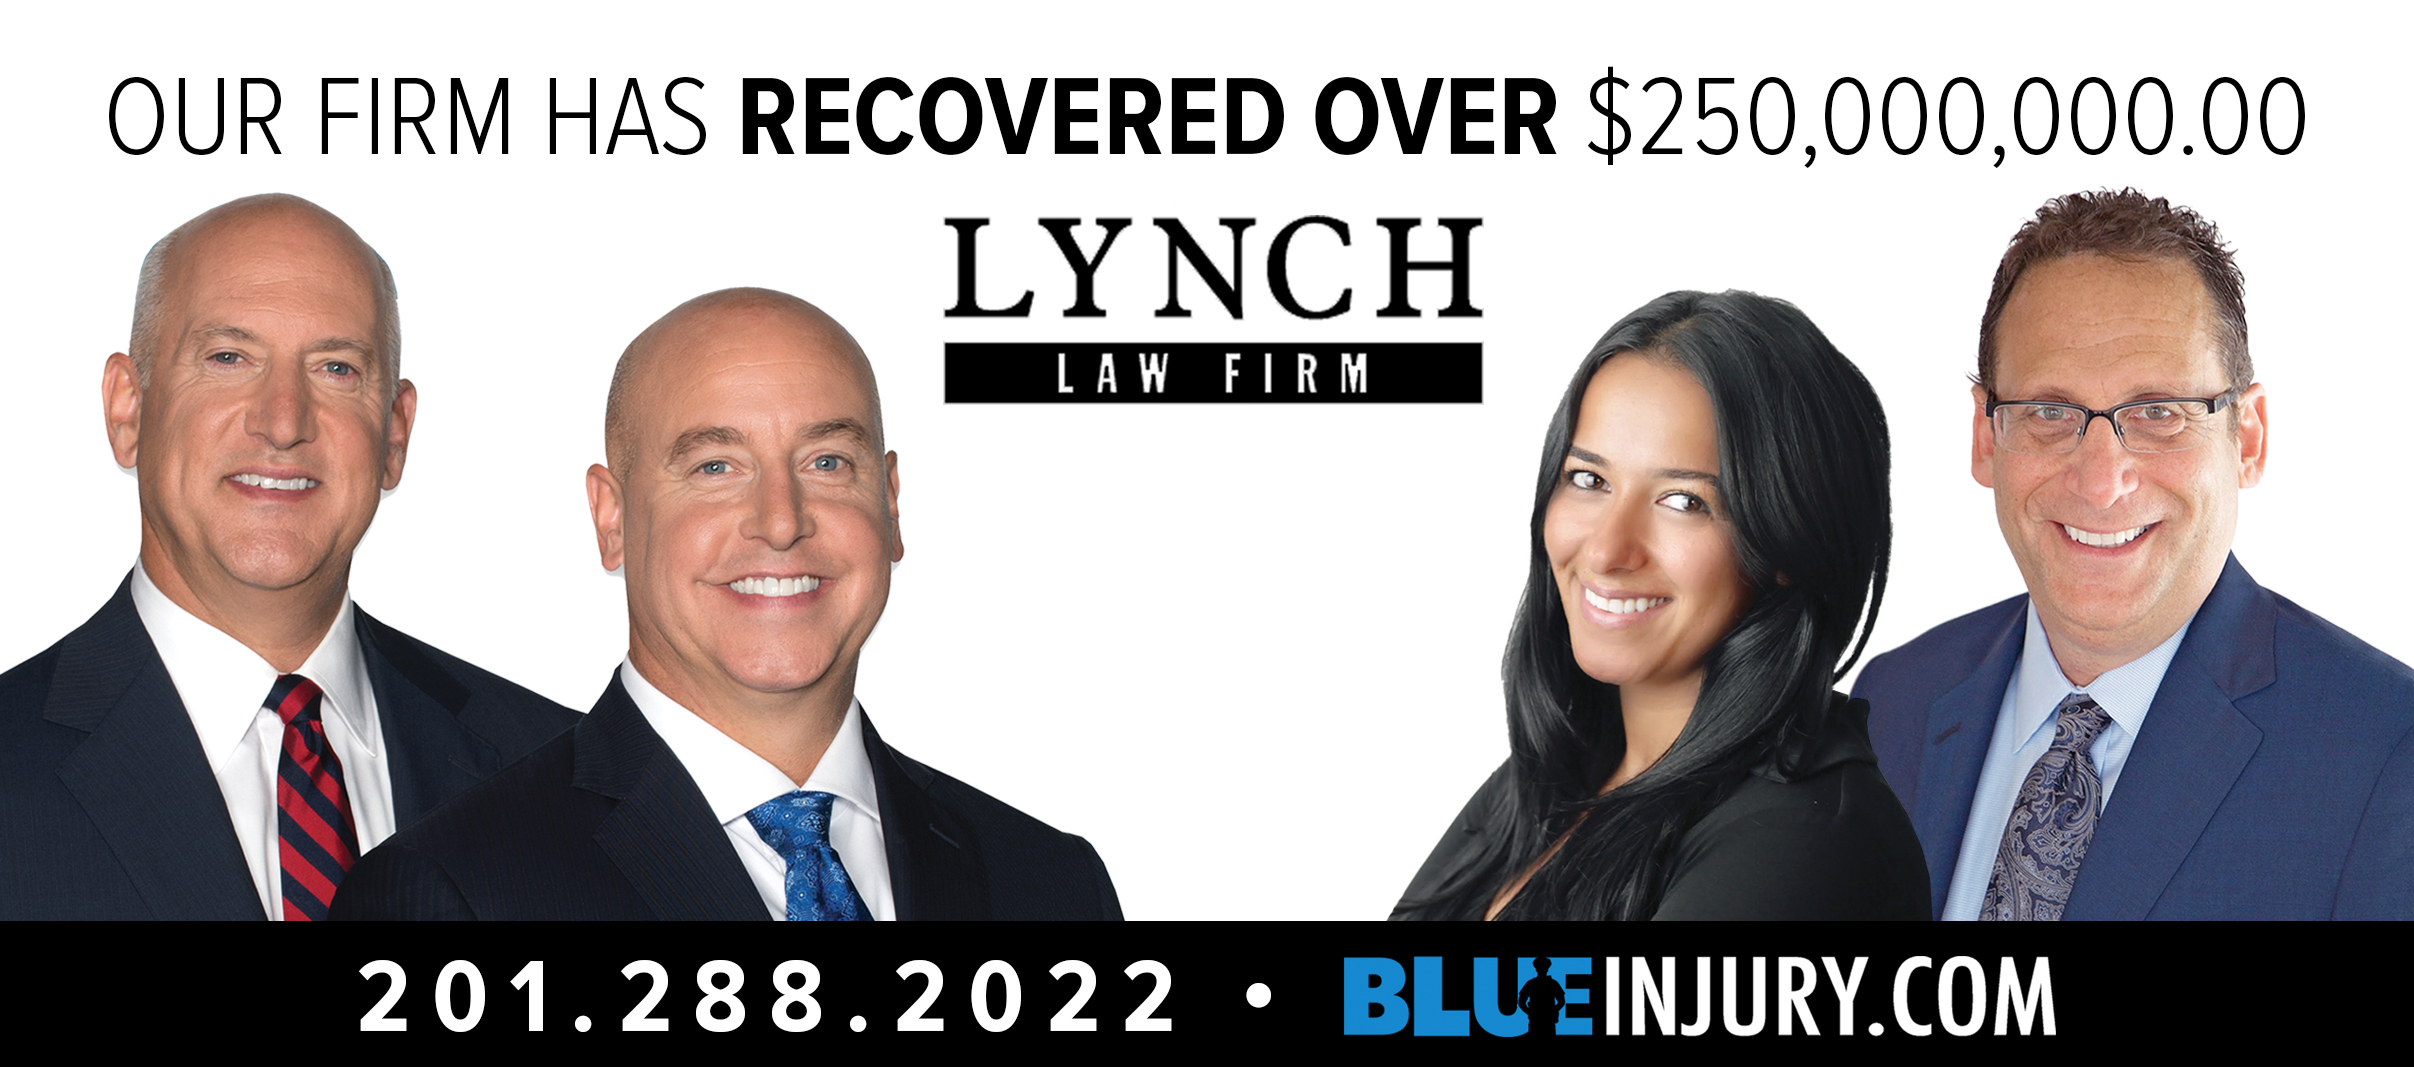 Lynch Full Banner Ad.jpg